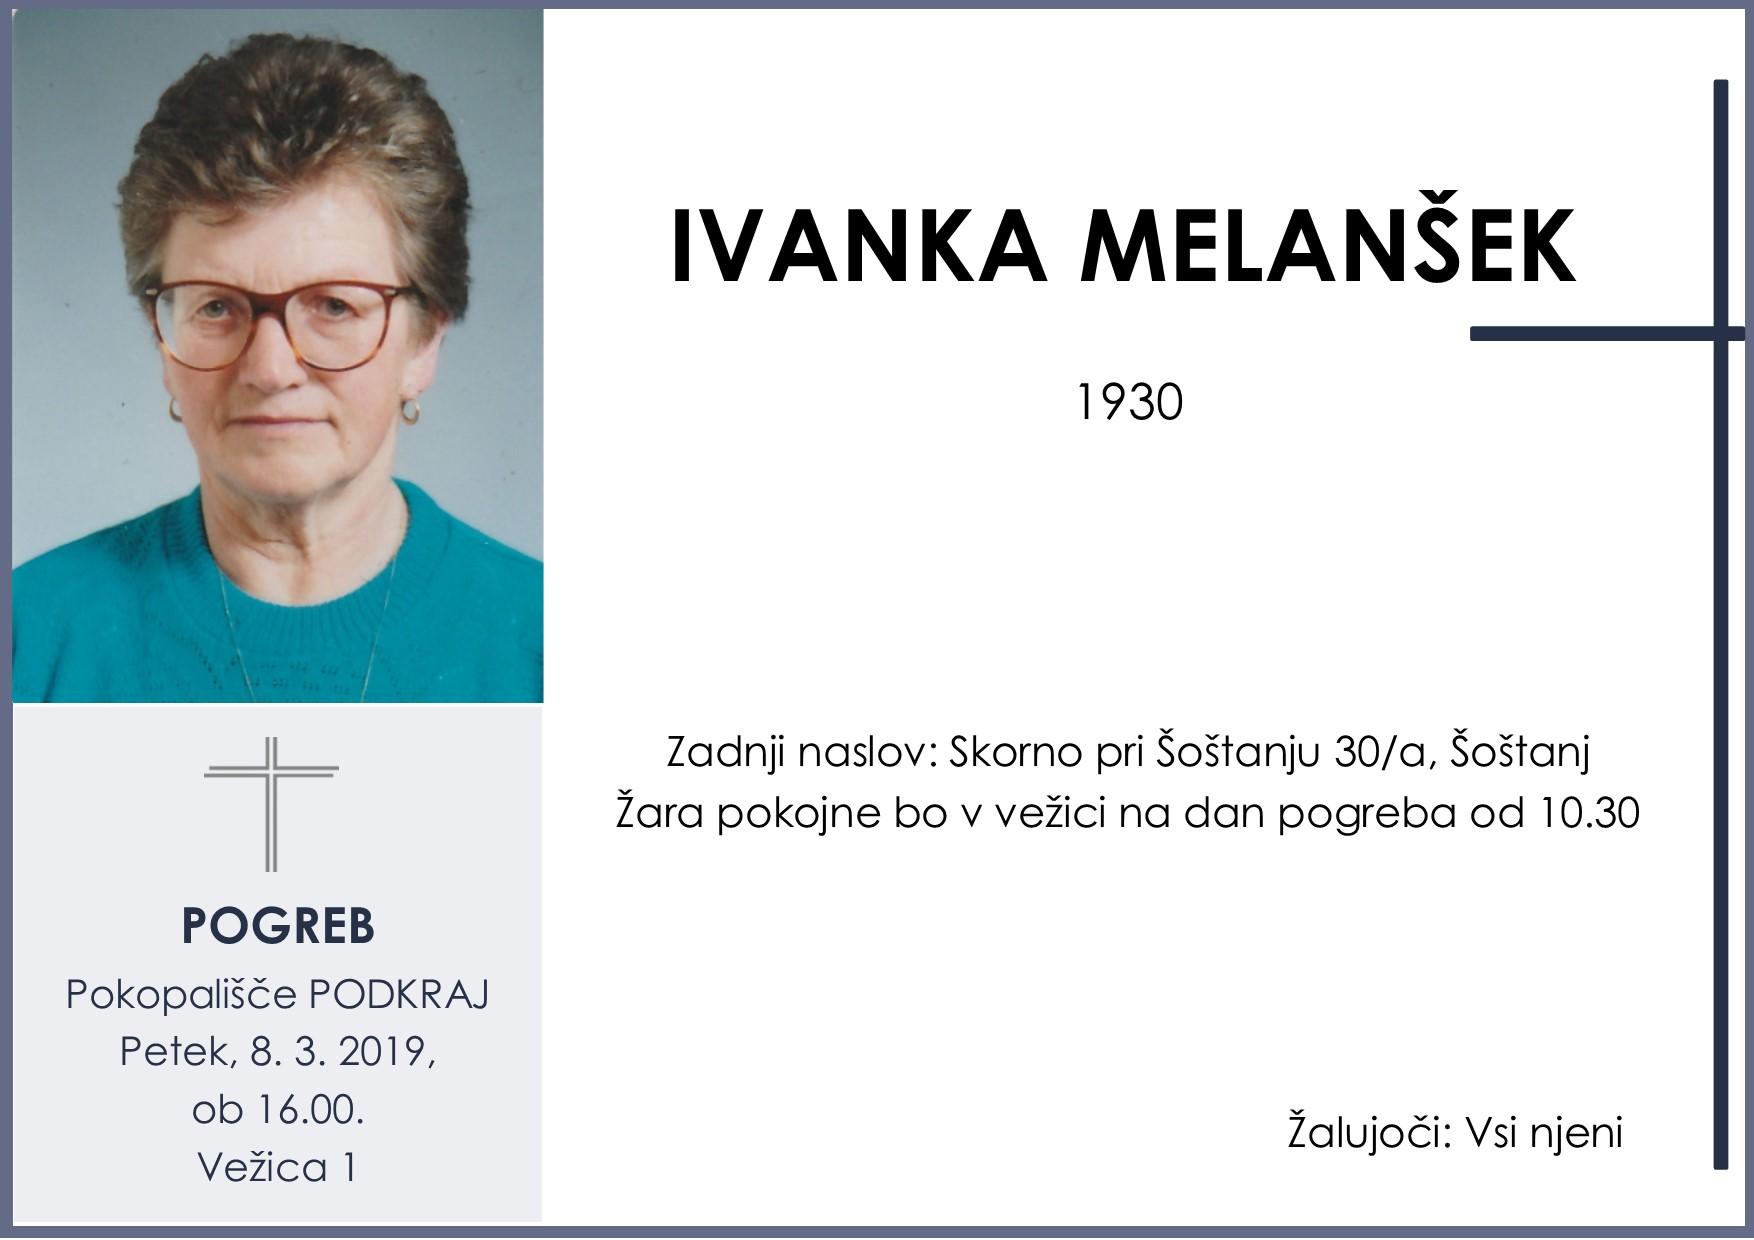 IVANKA MELANŠEK, Podkraj, 08. 03. 2019